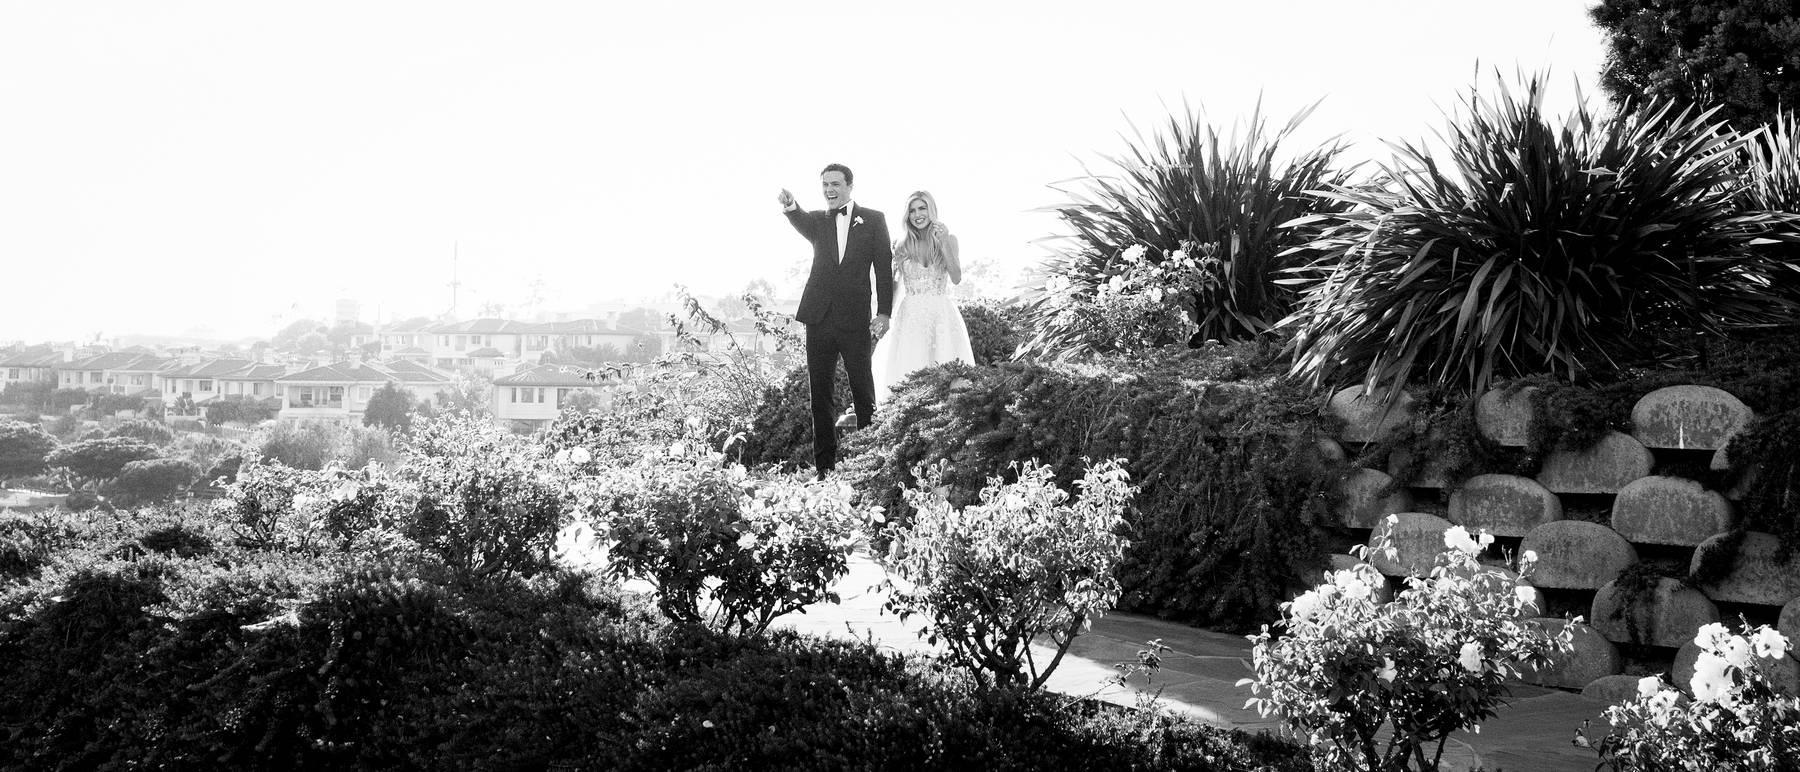 johnandjoseph-wedding-photographer-hz-slider-284